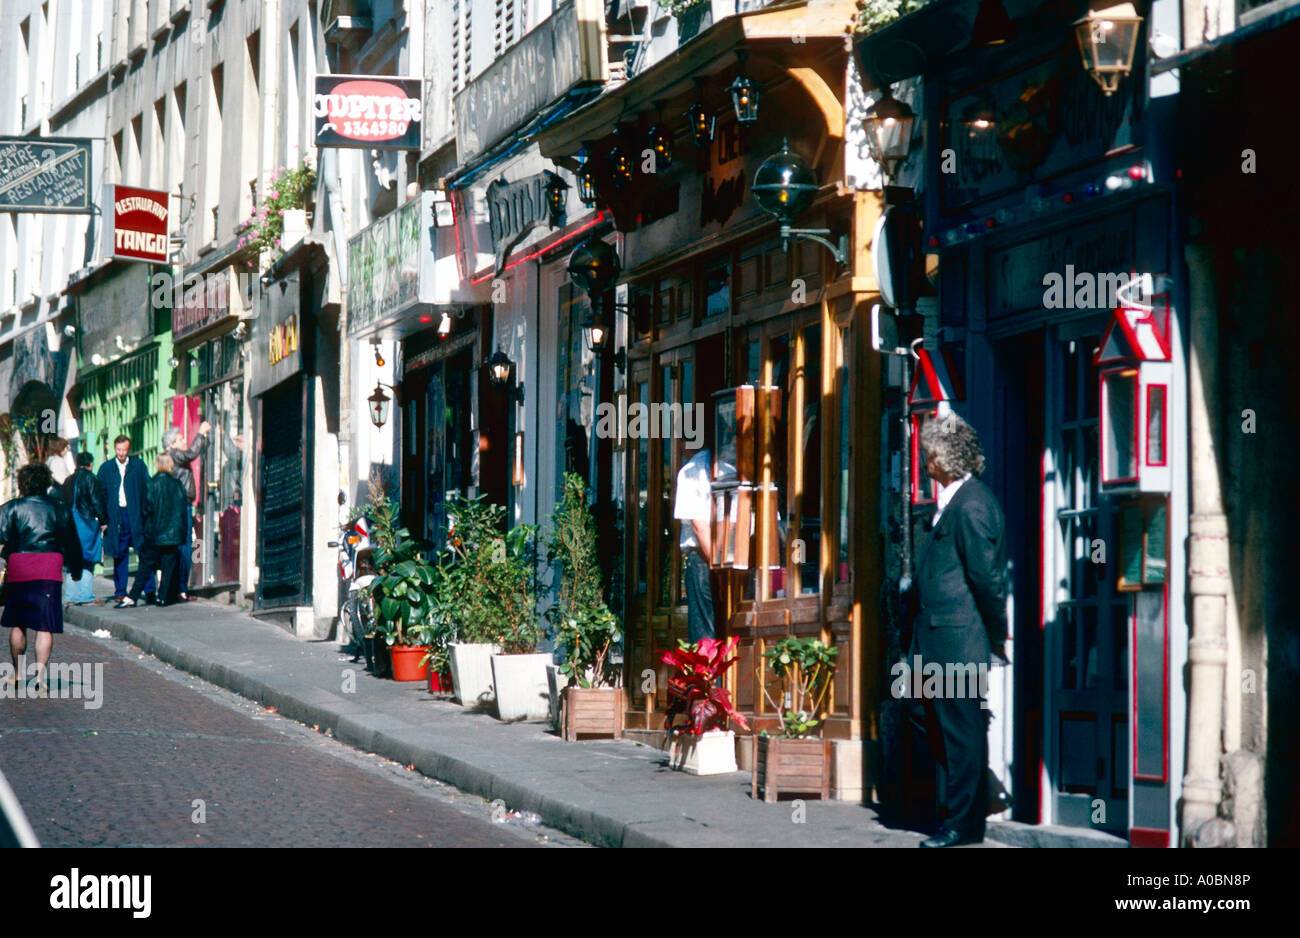 Restaurant Rue Mouffetard Paris Stock Photo, Royalty Free Image ...